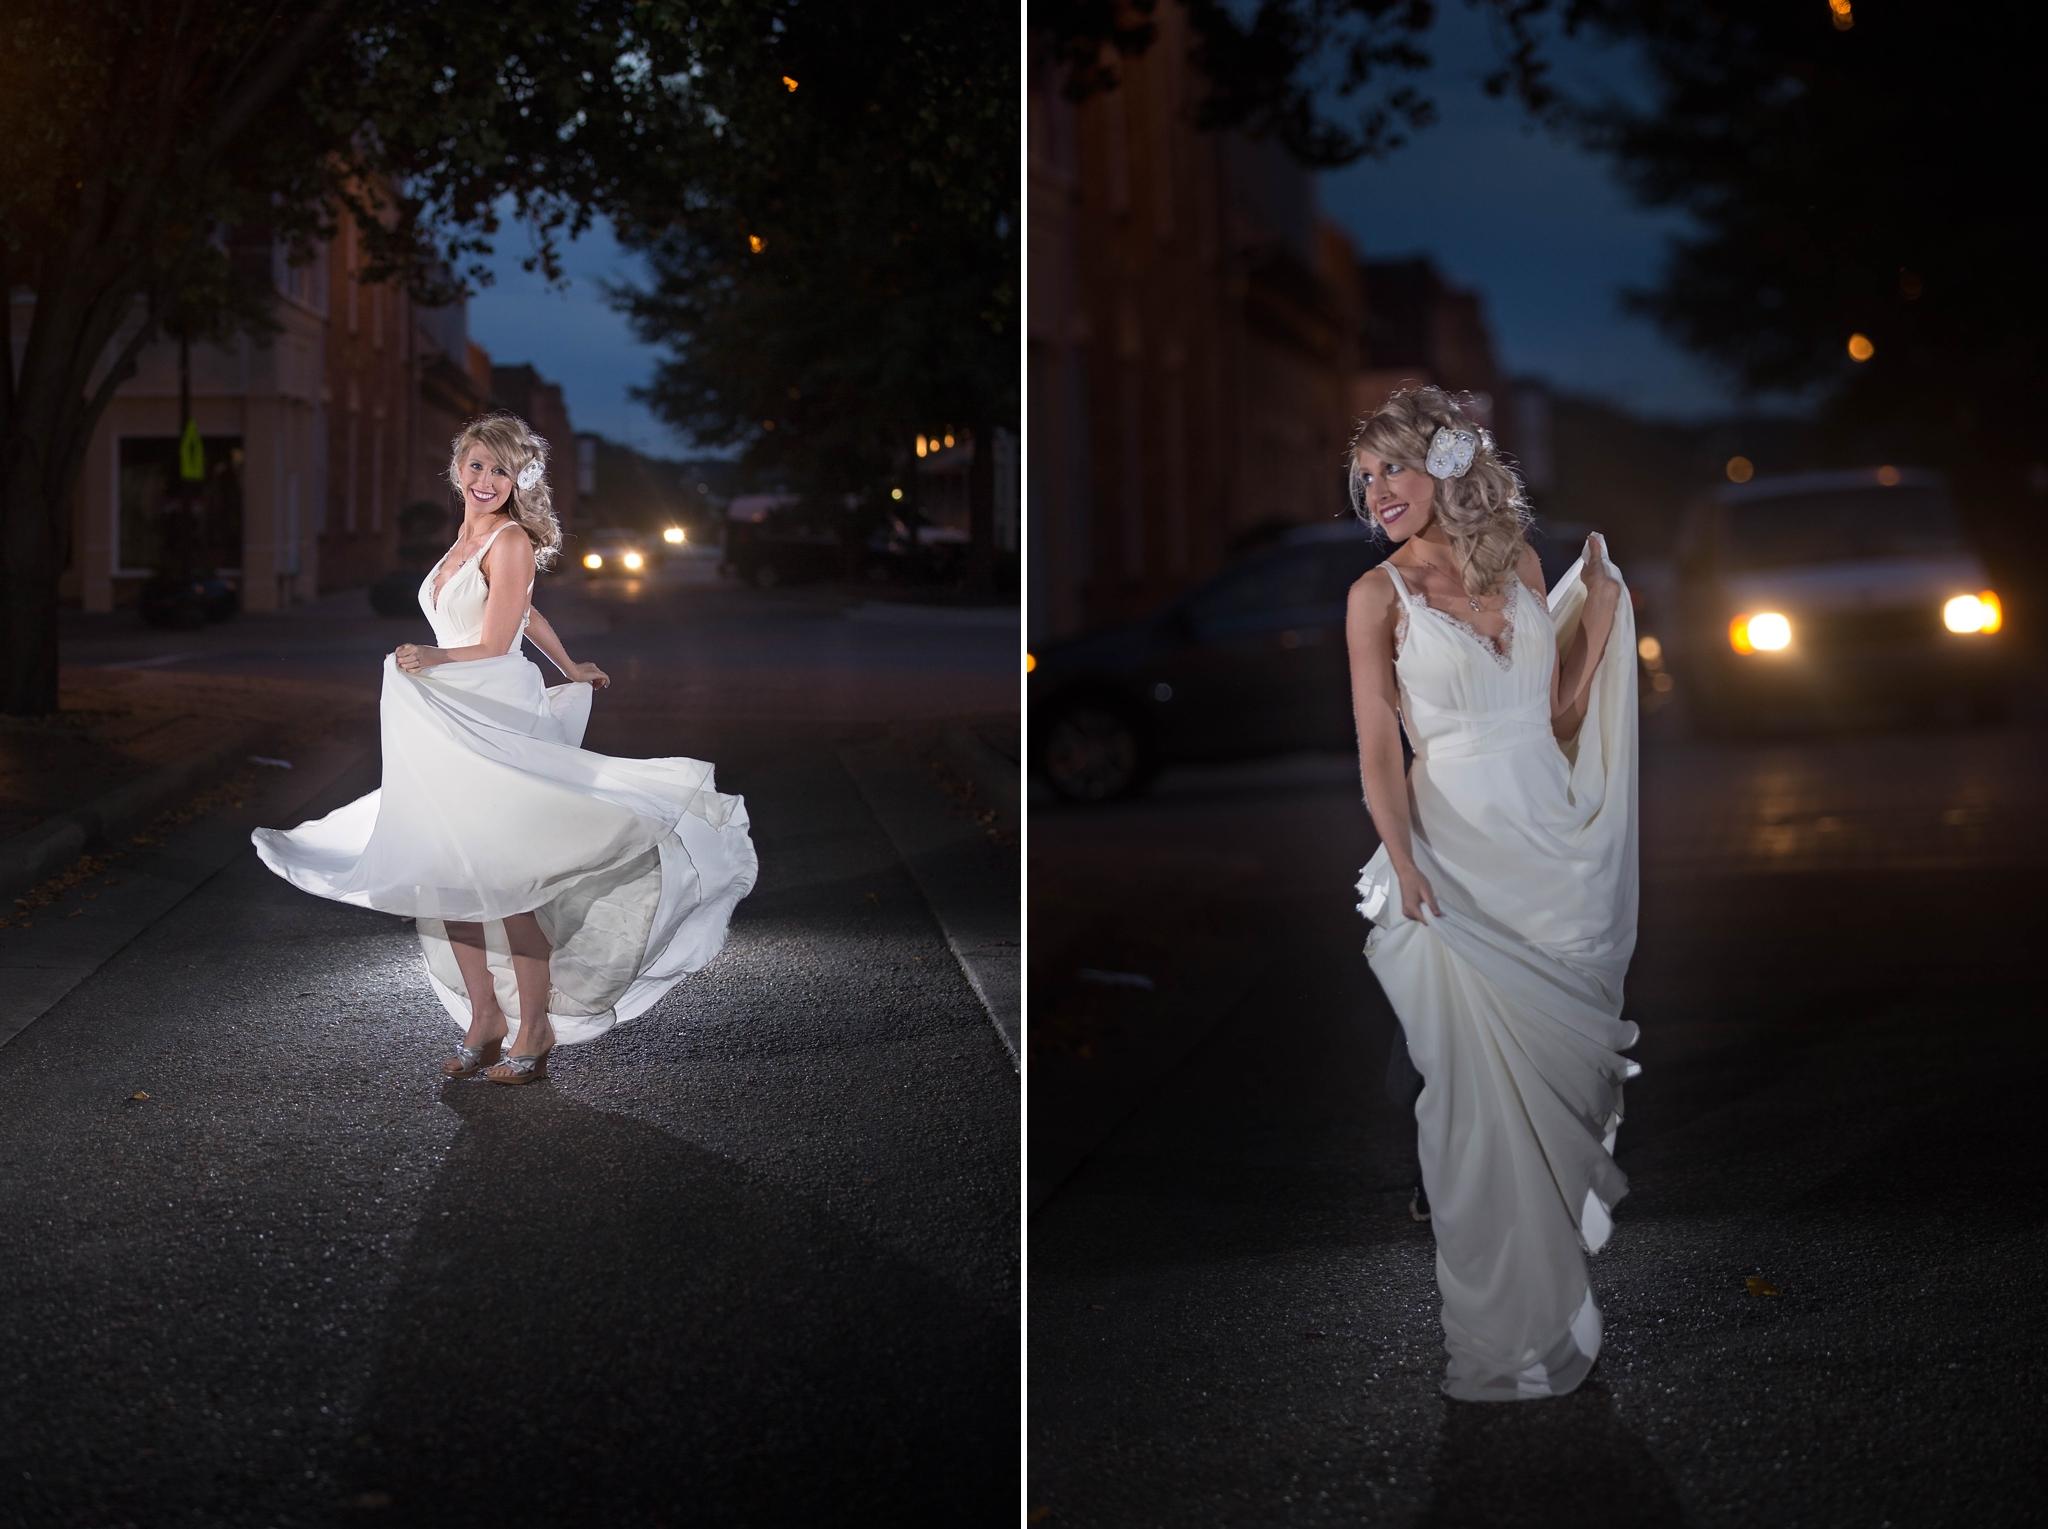 Wedding Portraits at Night in Downtown Fayetteville, NC  using Speedlights OCF - Raleigh North Carolina Wedding Photographer